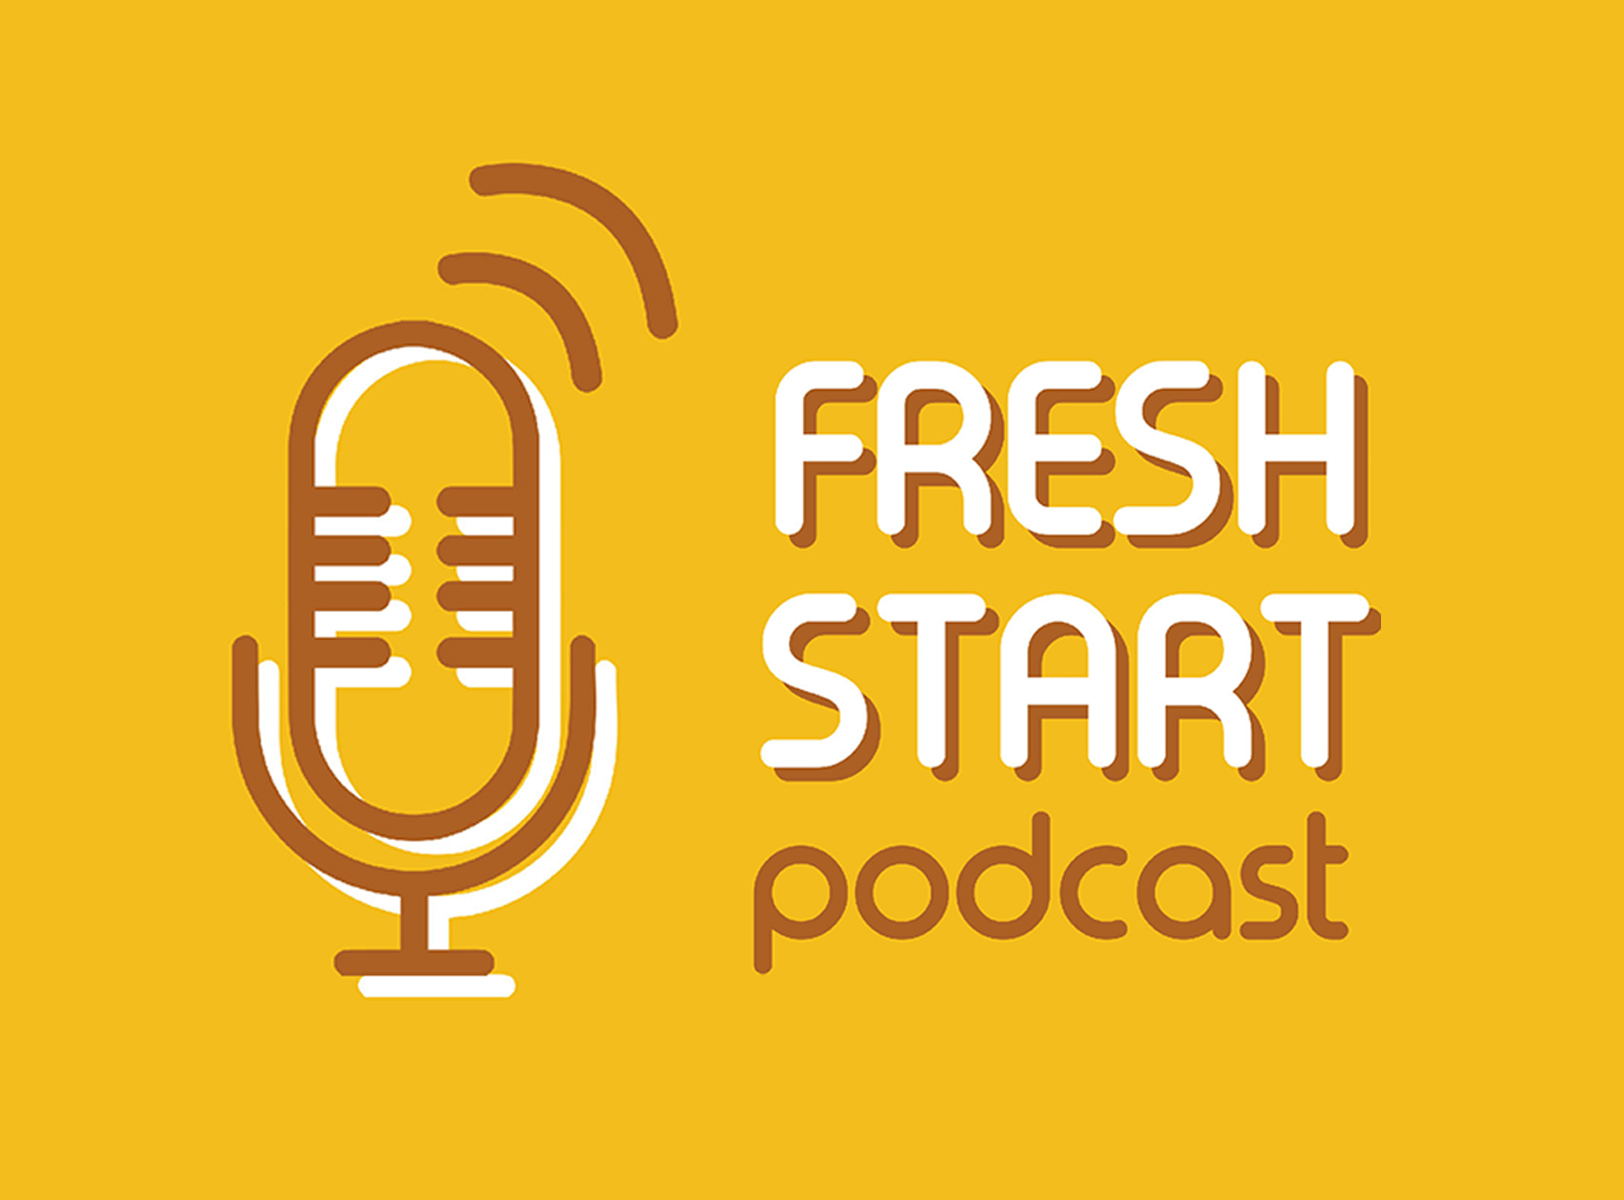 Fresh Start: Podcast News (7/7/2019 Sun.)